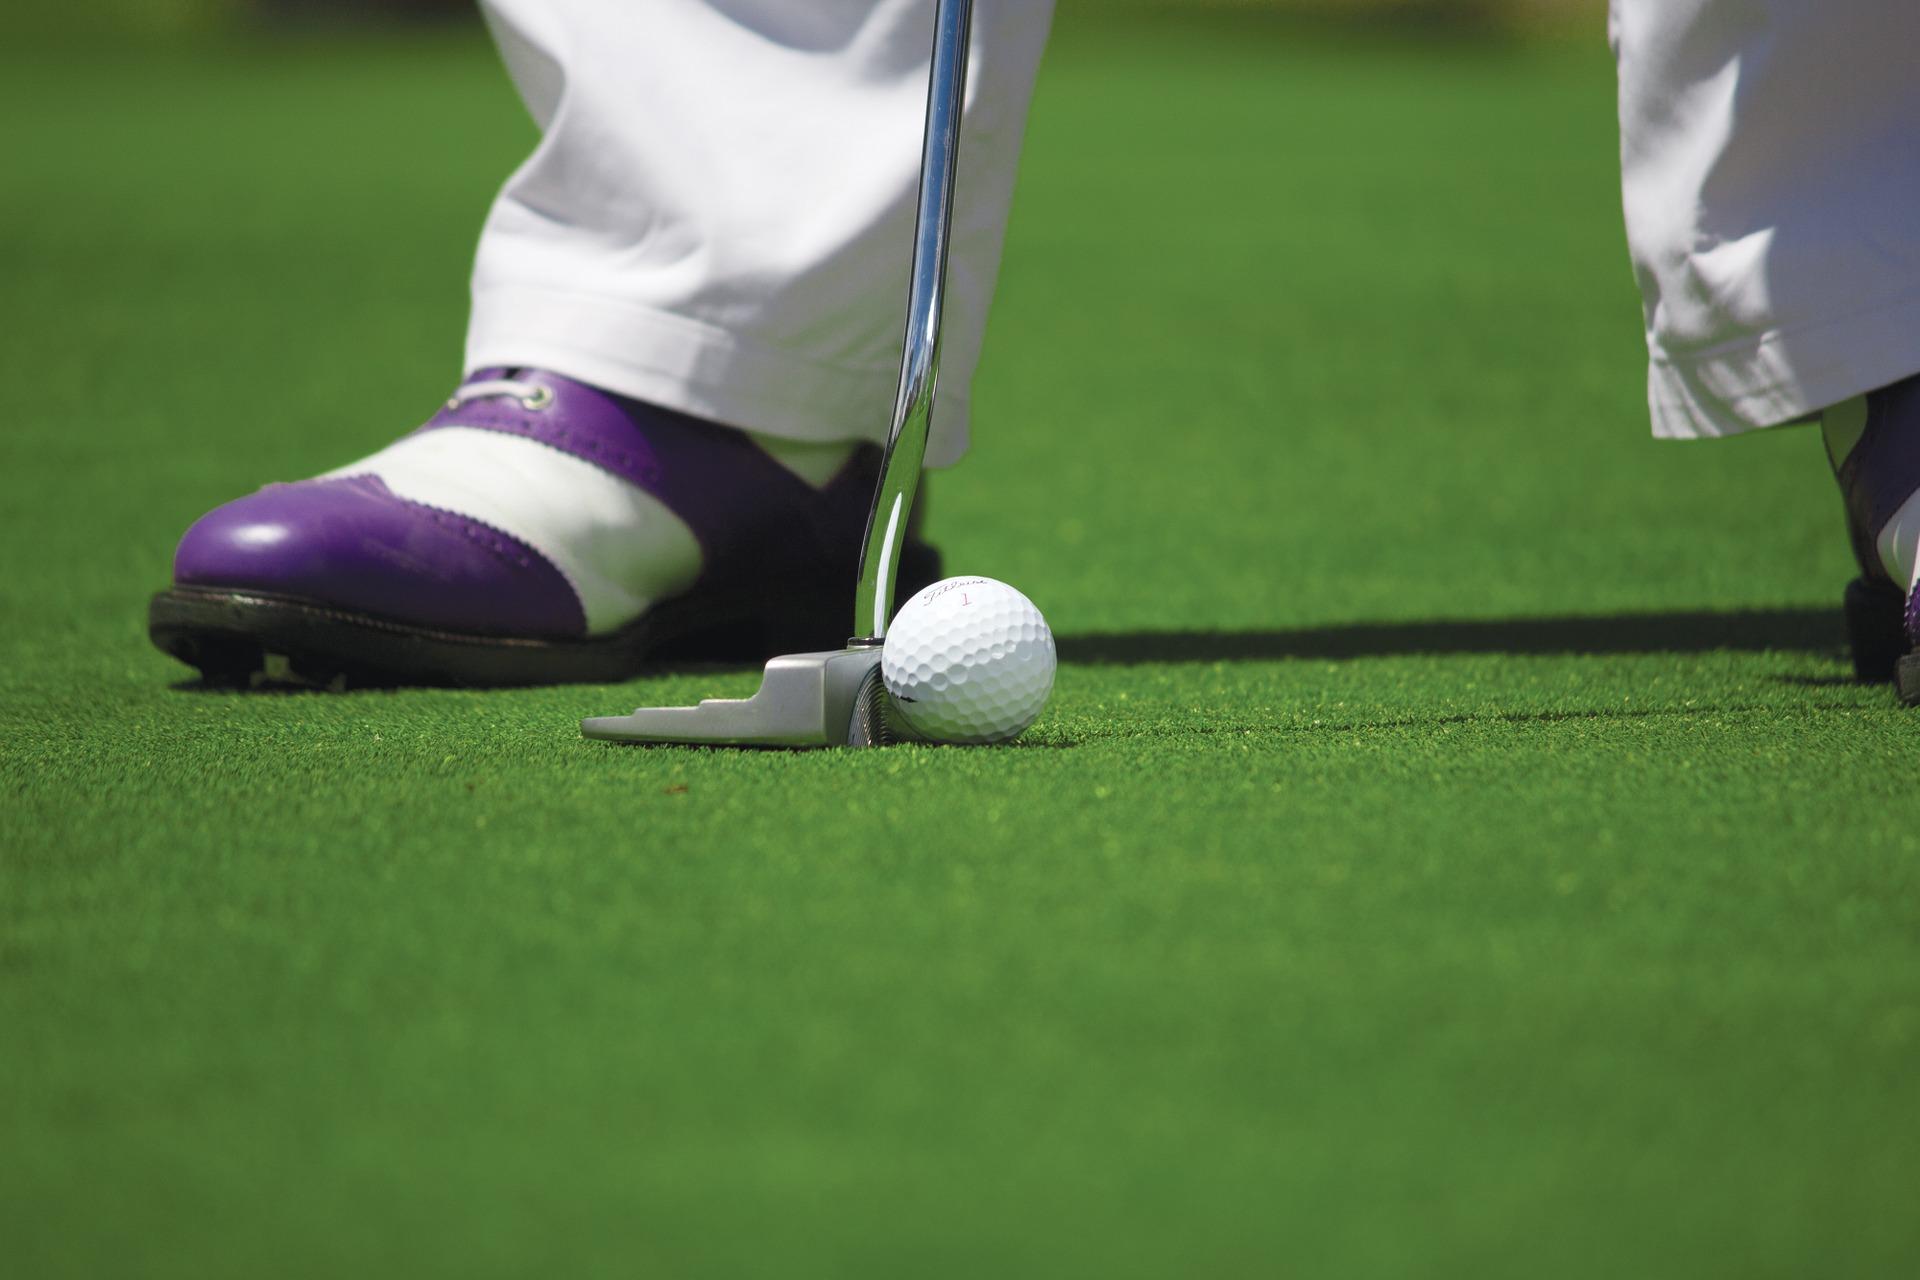 golf Improve stability